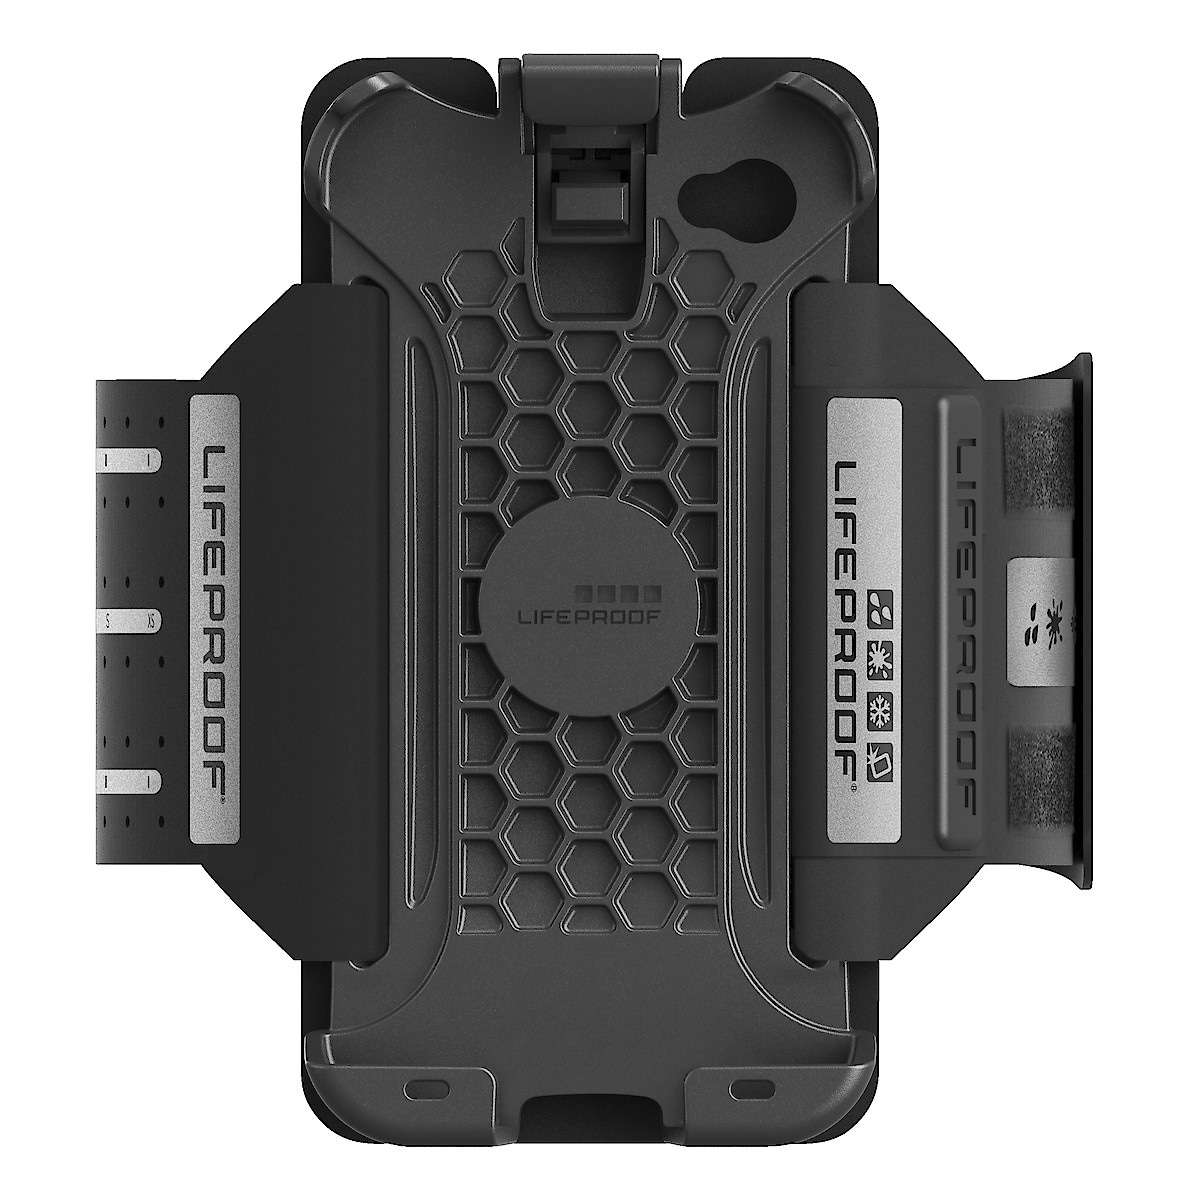 Sportarmband för iPhone 4/4S Lifeproof